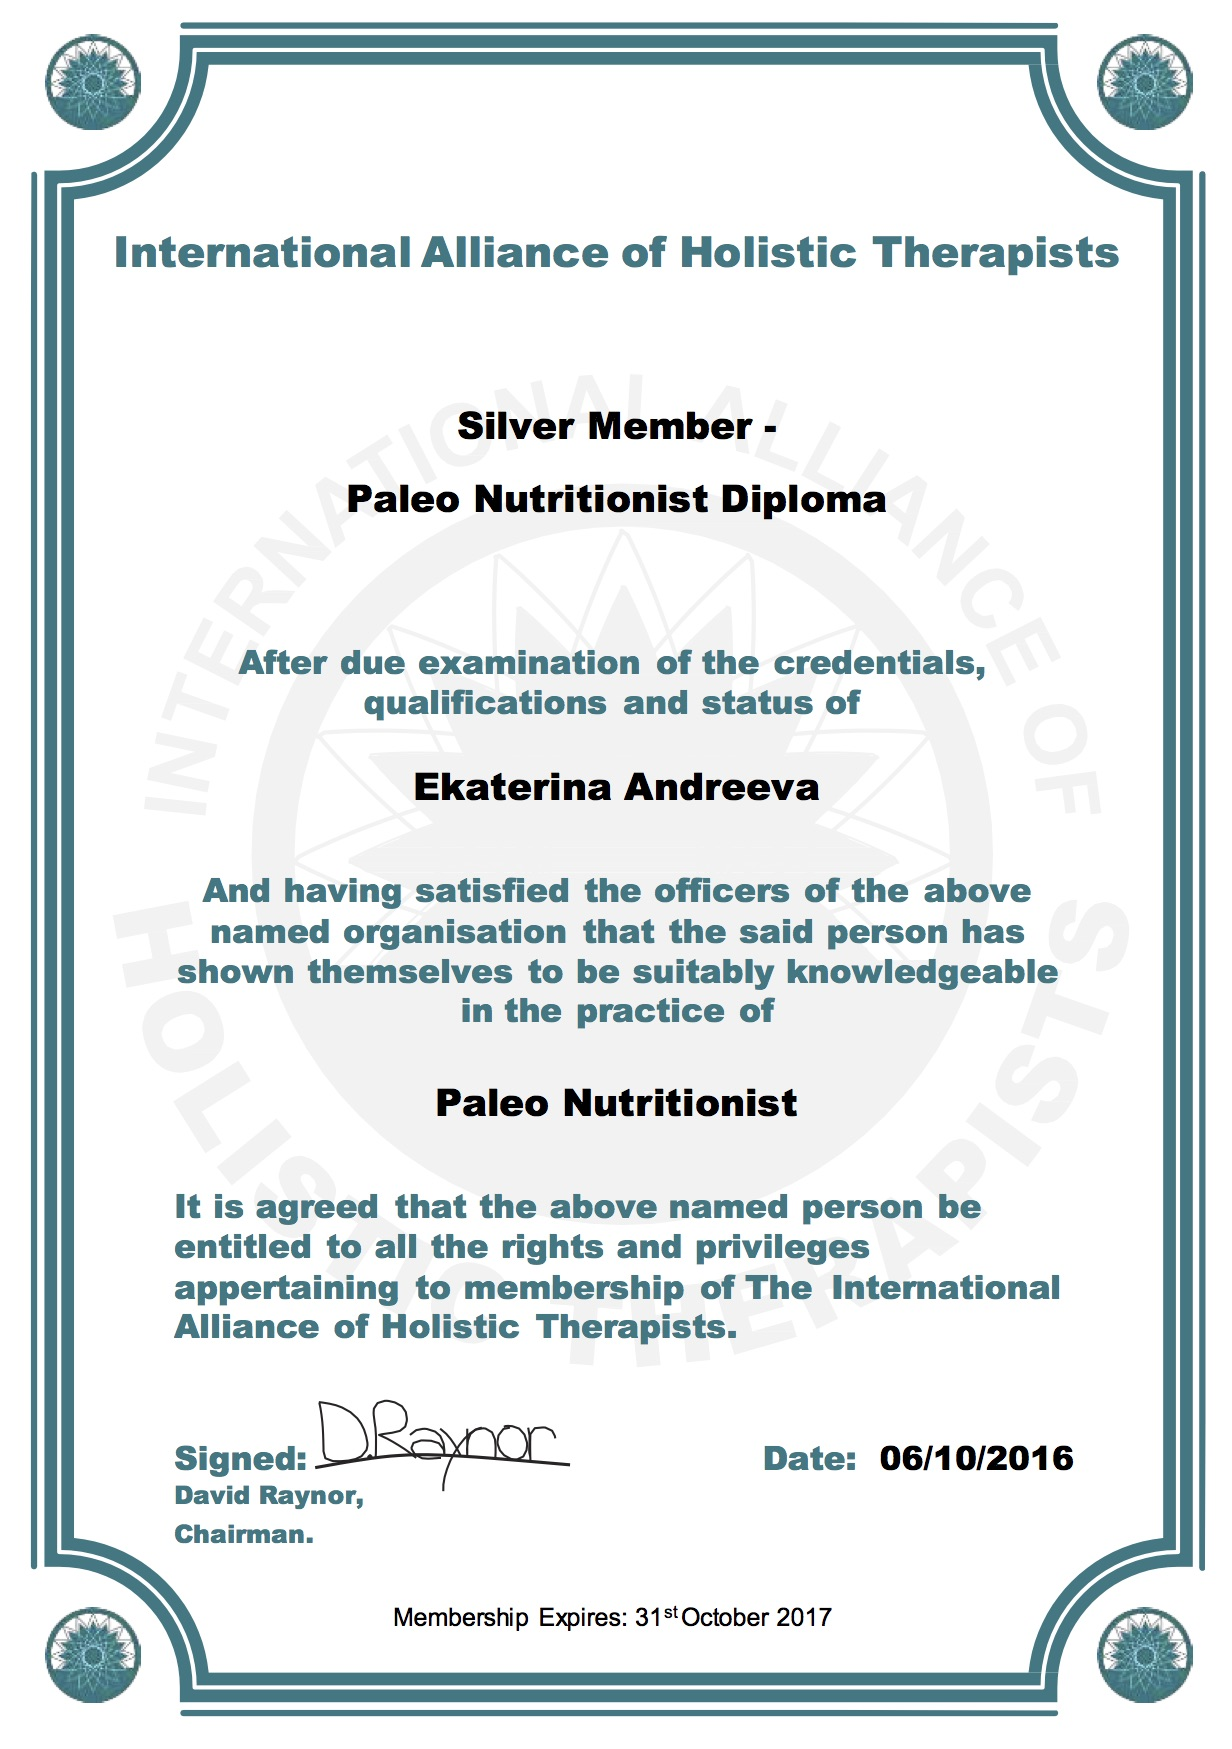 iaht-certificate